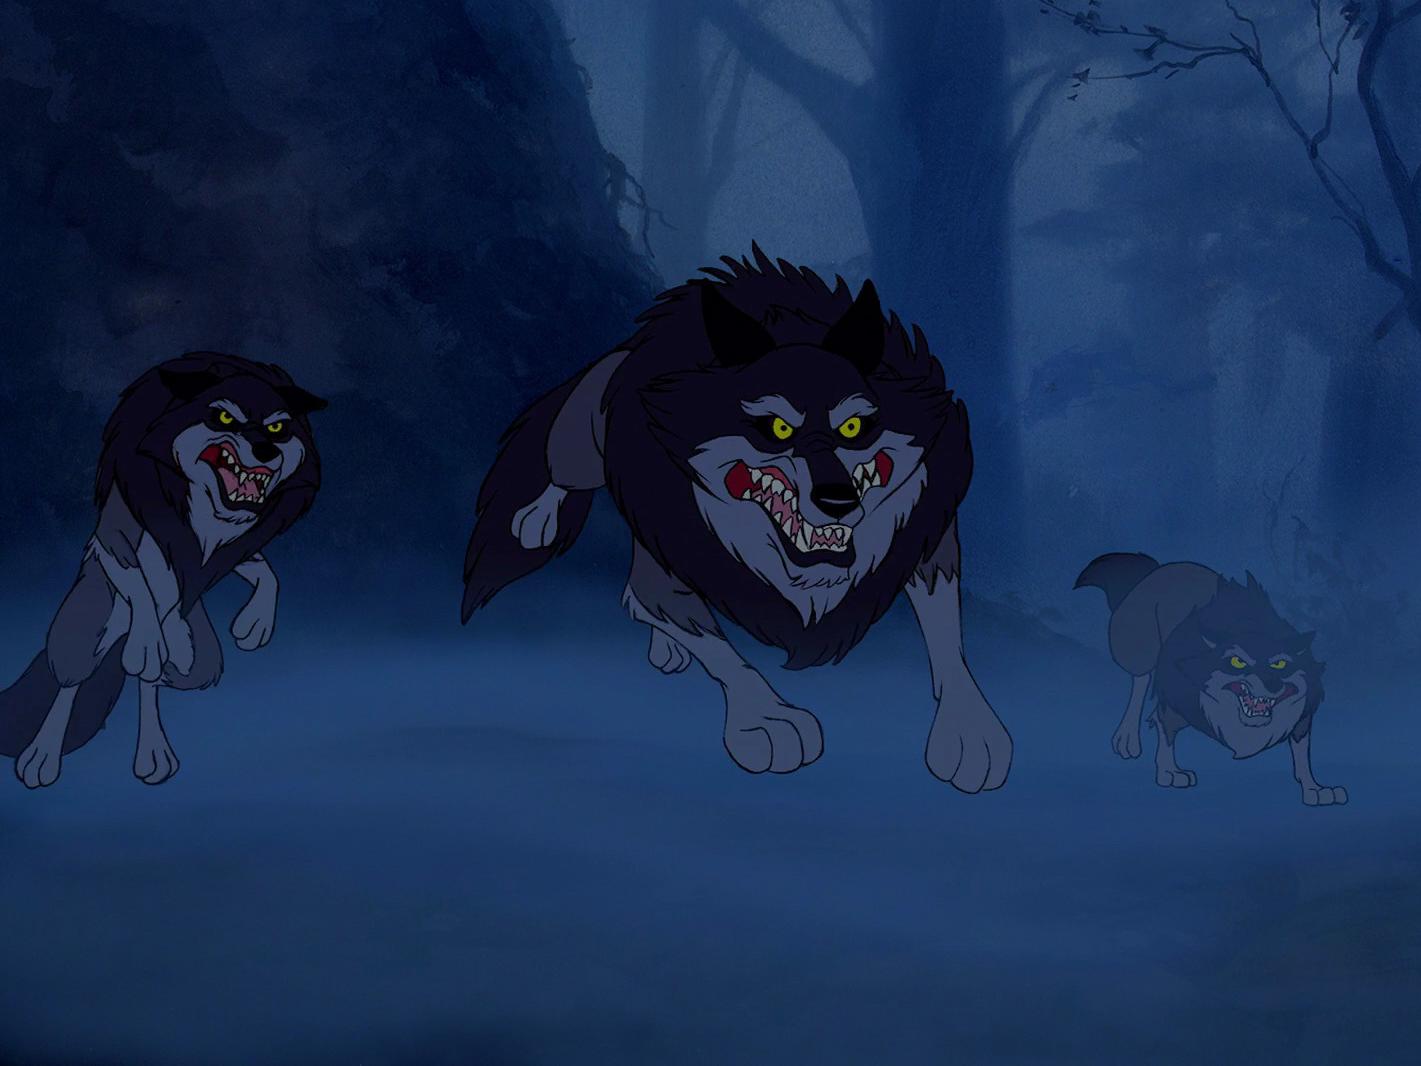 Los Lobos (Beauty and the Beast)